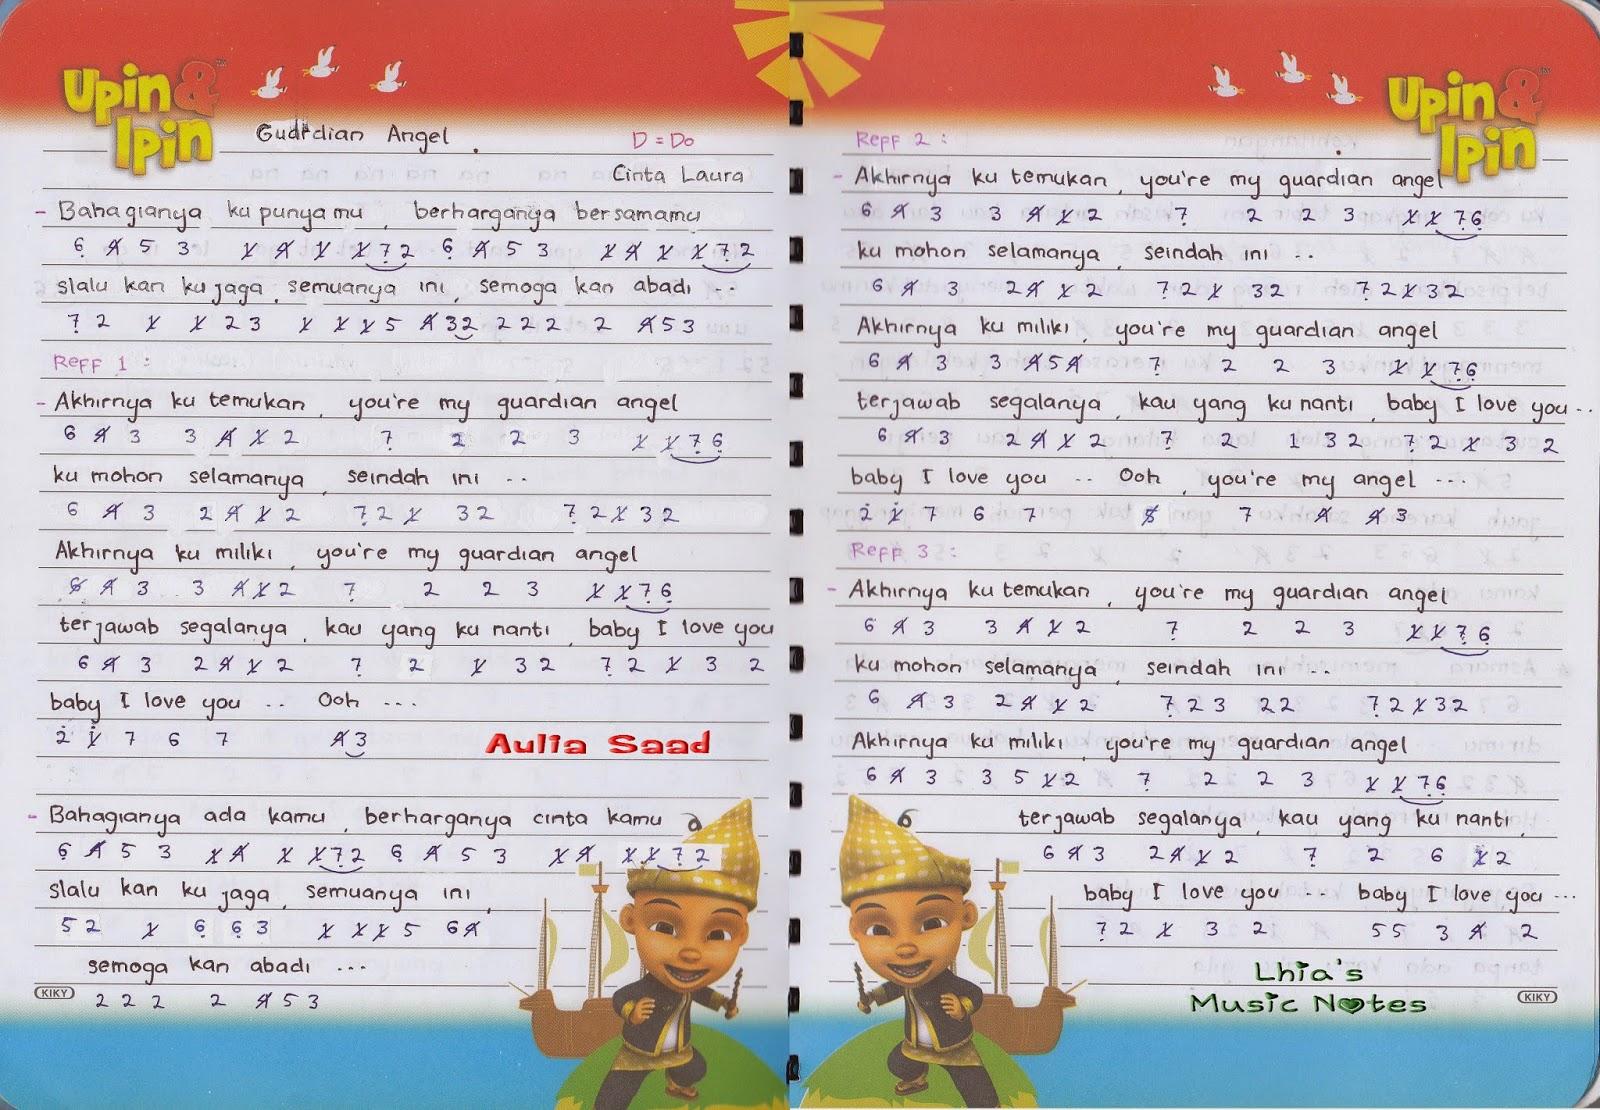 not lagu – Soloist wanita | Lhia's Music Notes | Halaman 8